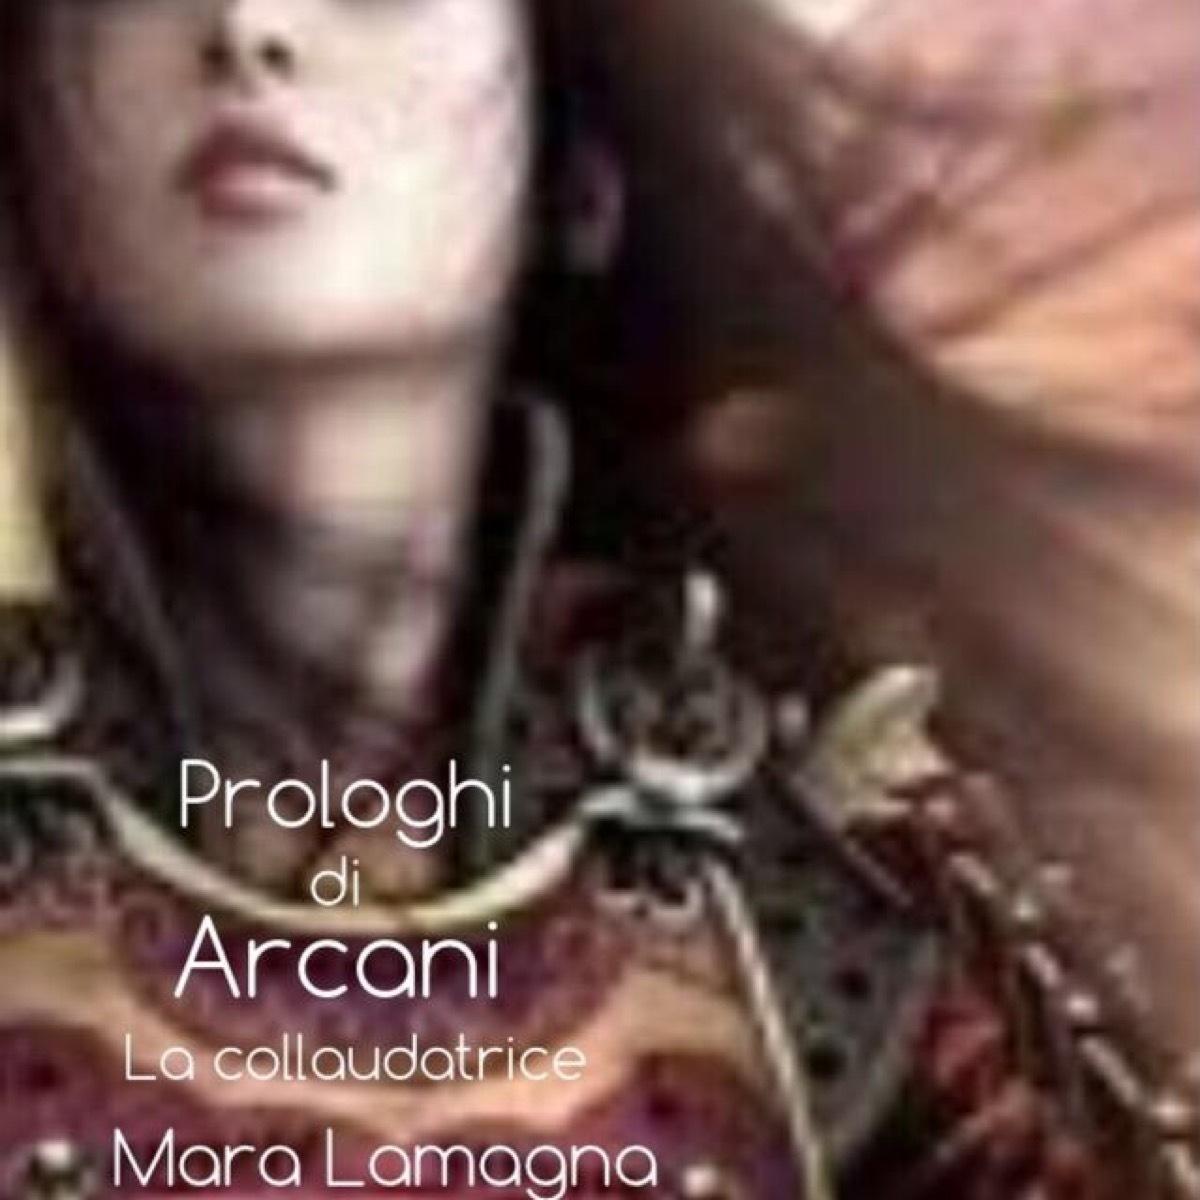 Prologhi di Arcani - La collaudatrice  by  Mara Lamagna